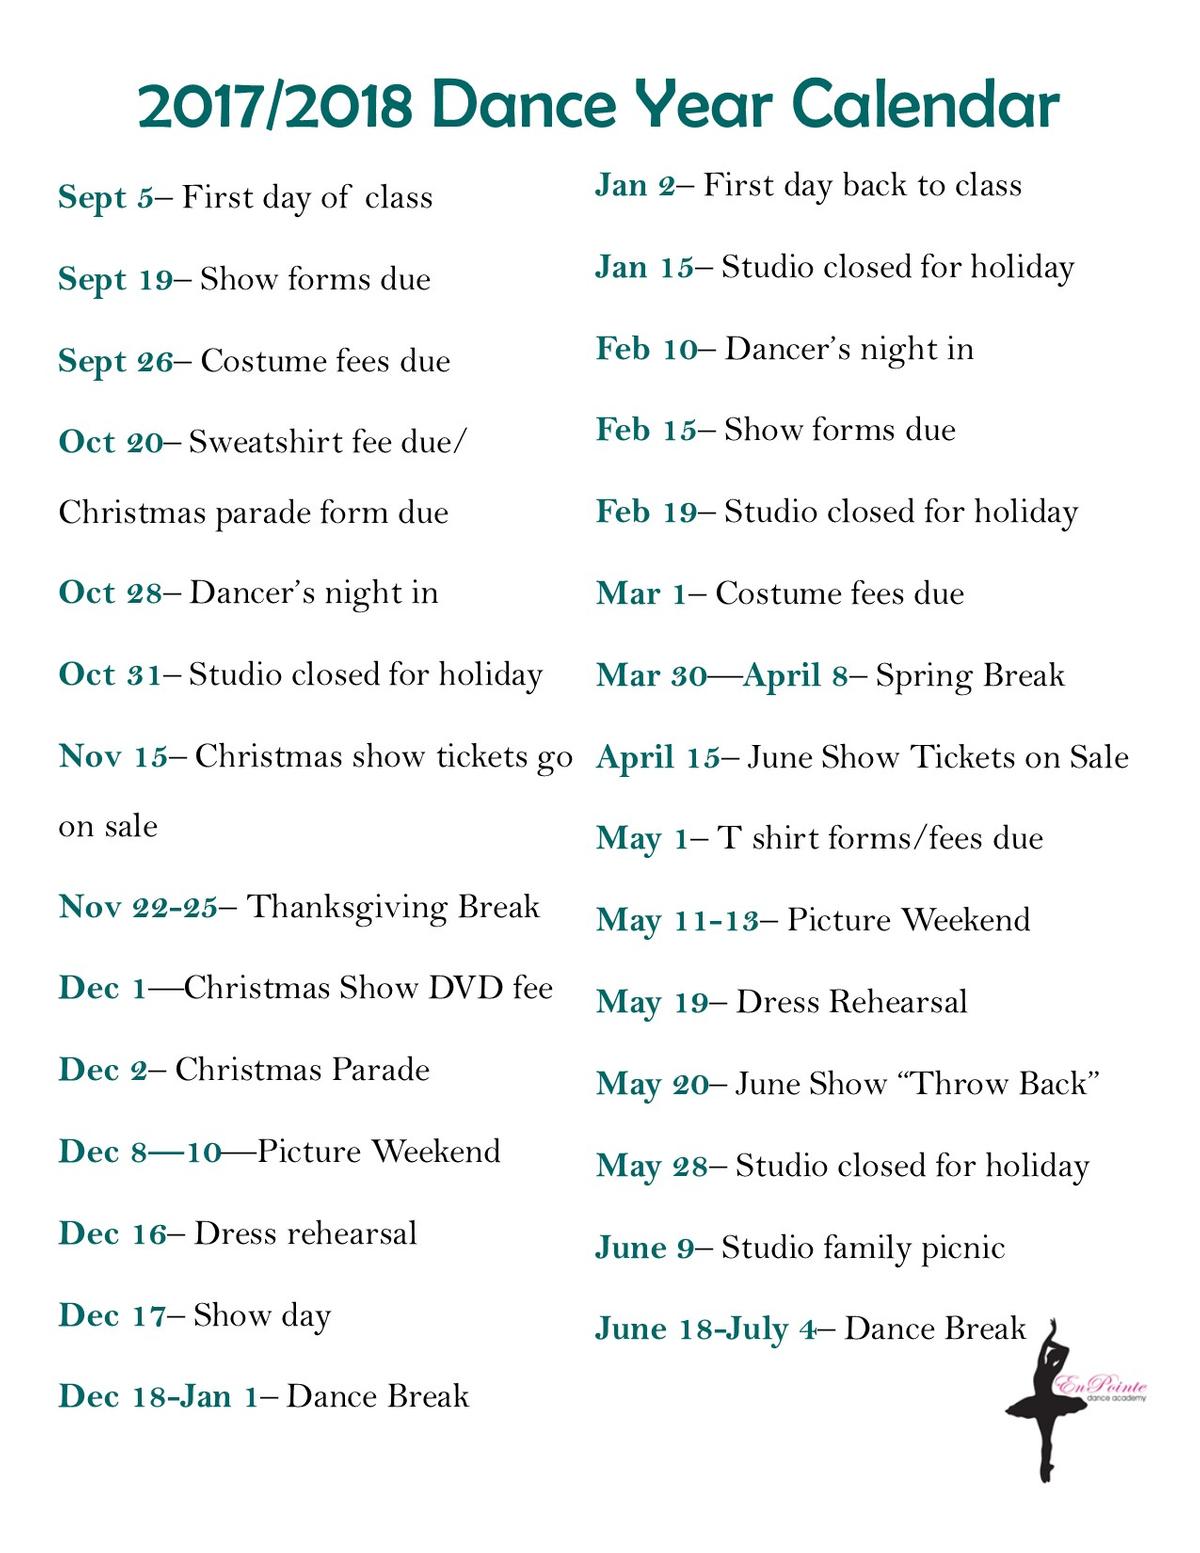 2017-2018 Important Dates.jpg